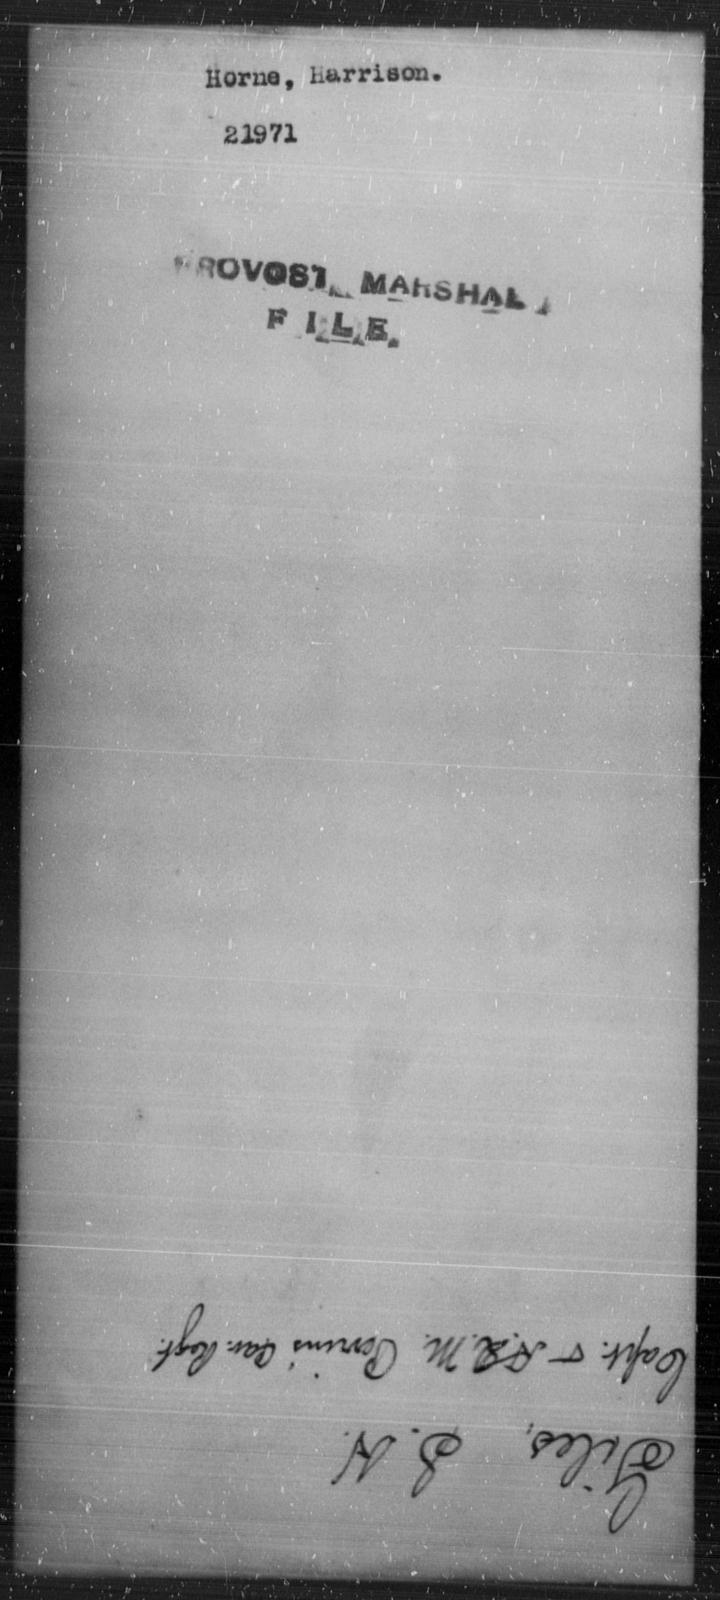 Horne, Harrison - State: [Blank] - Year: [Blank]